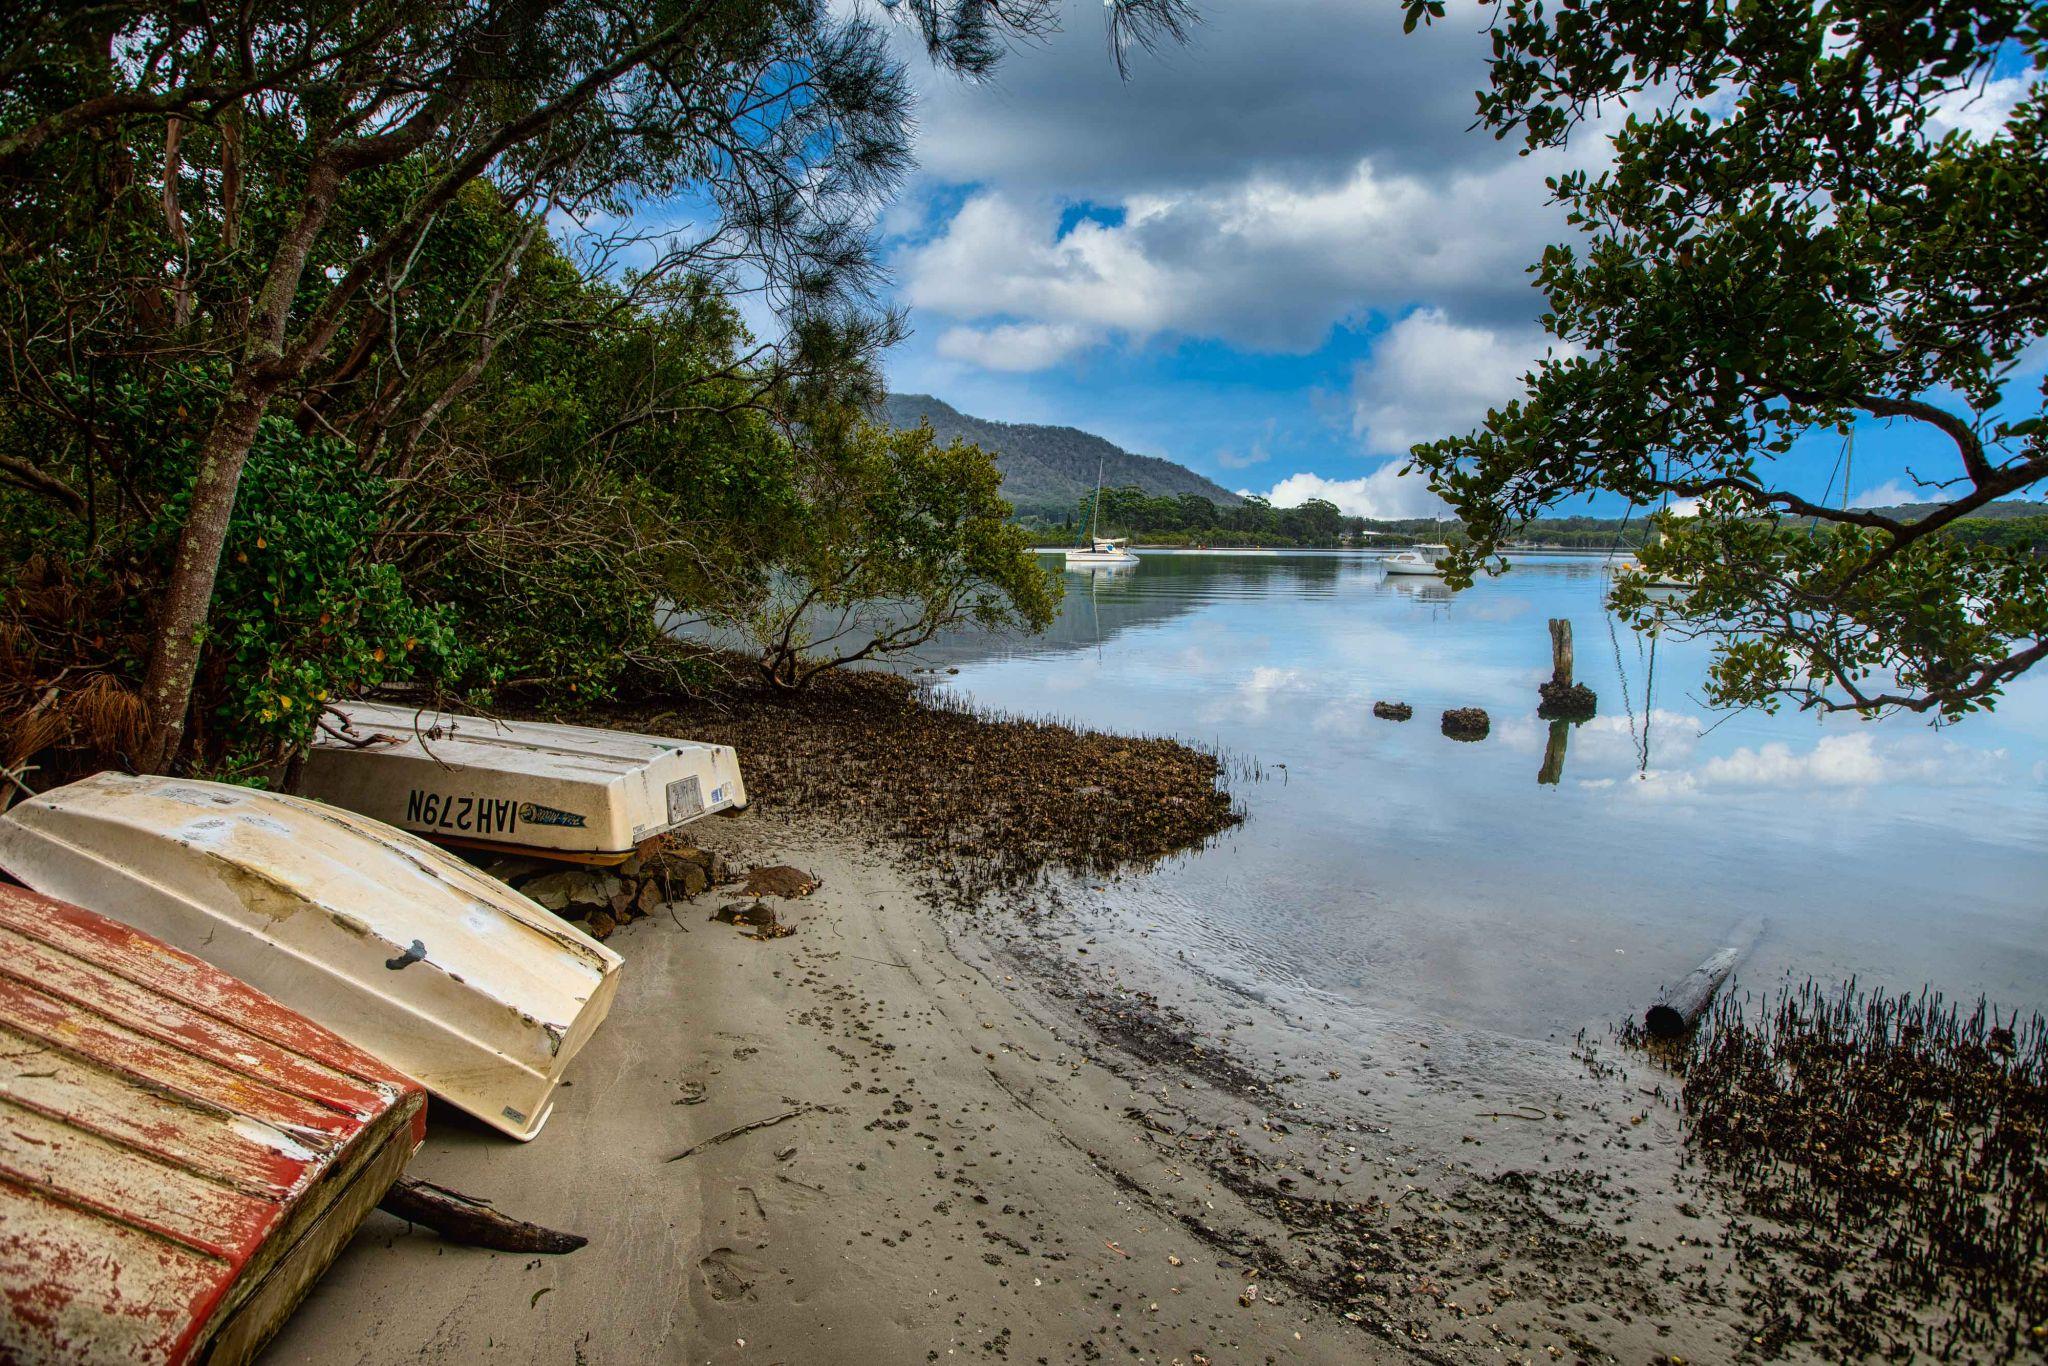 Small Boats & Mangroves Dunbogan New South Wales, Australia